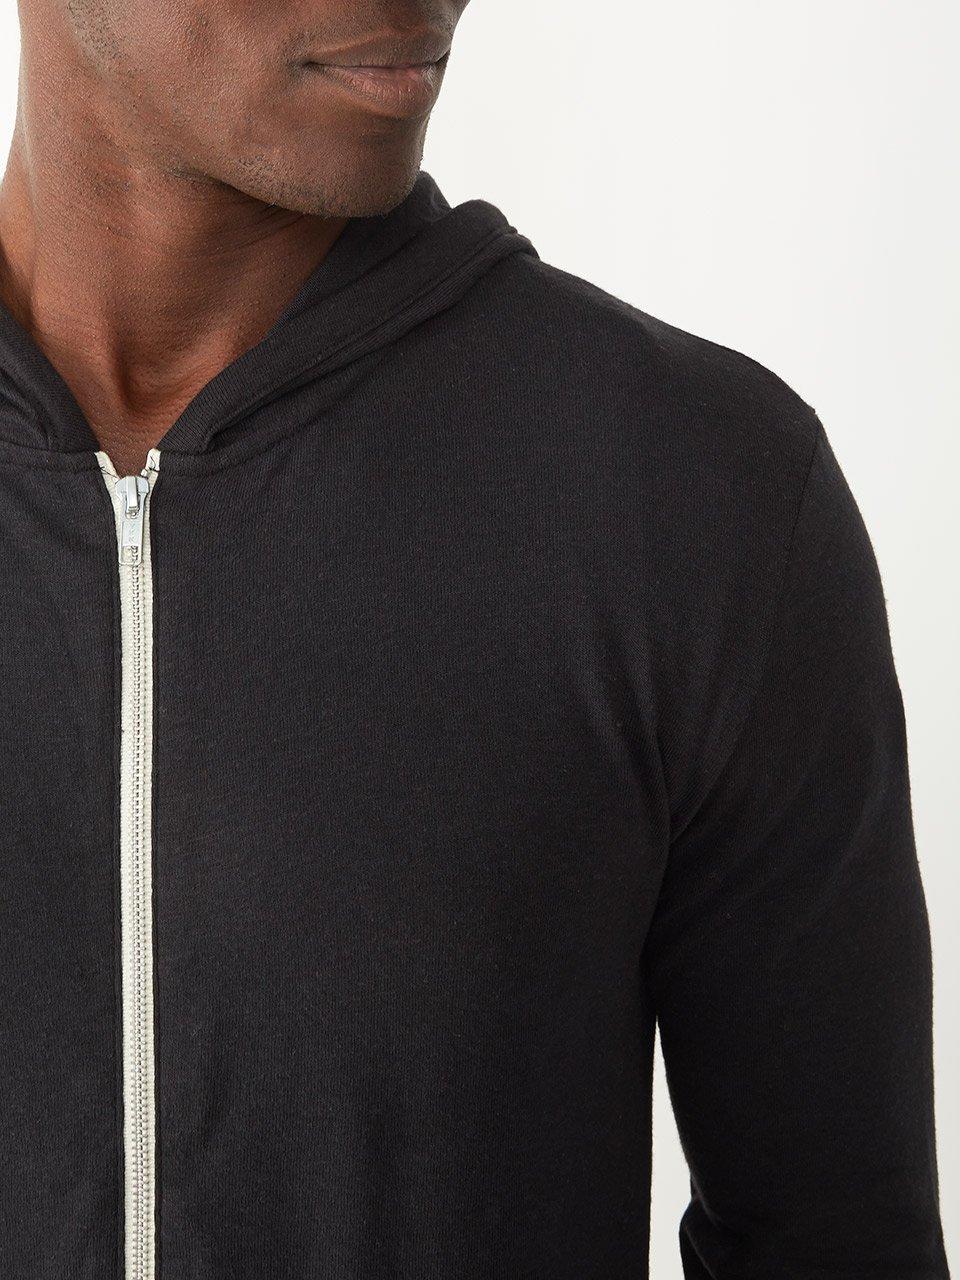 Alternative Men's Eco Zip Hoodie Sweatshirt Shirt, Eco True Black, Medium by Alternative (Image #4)